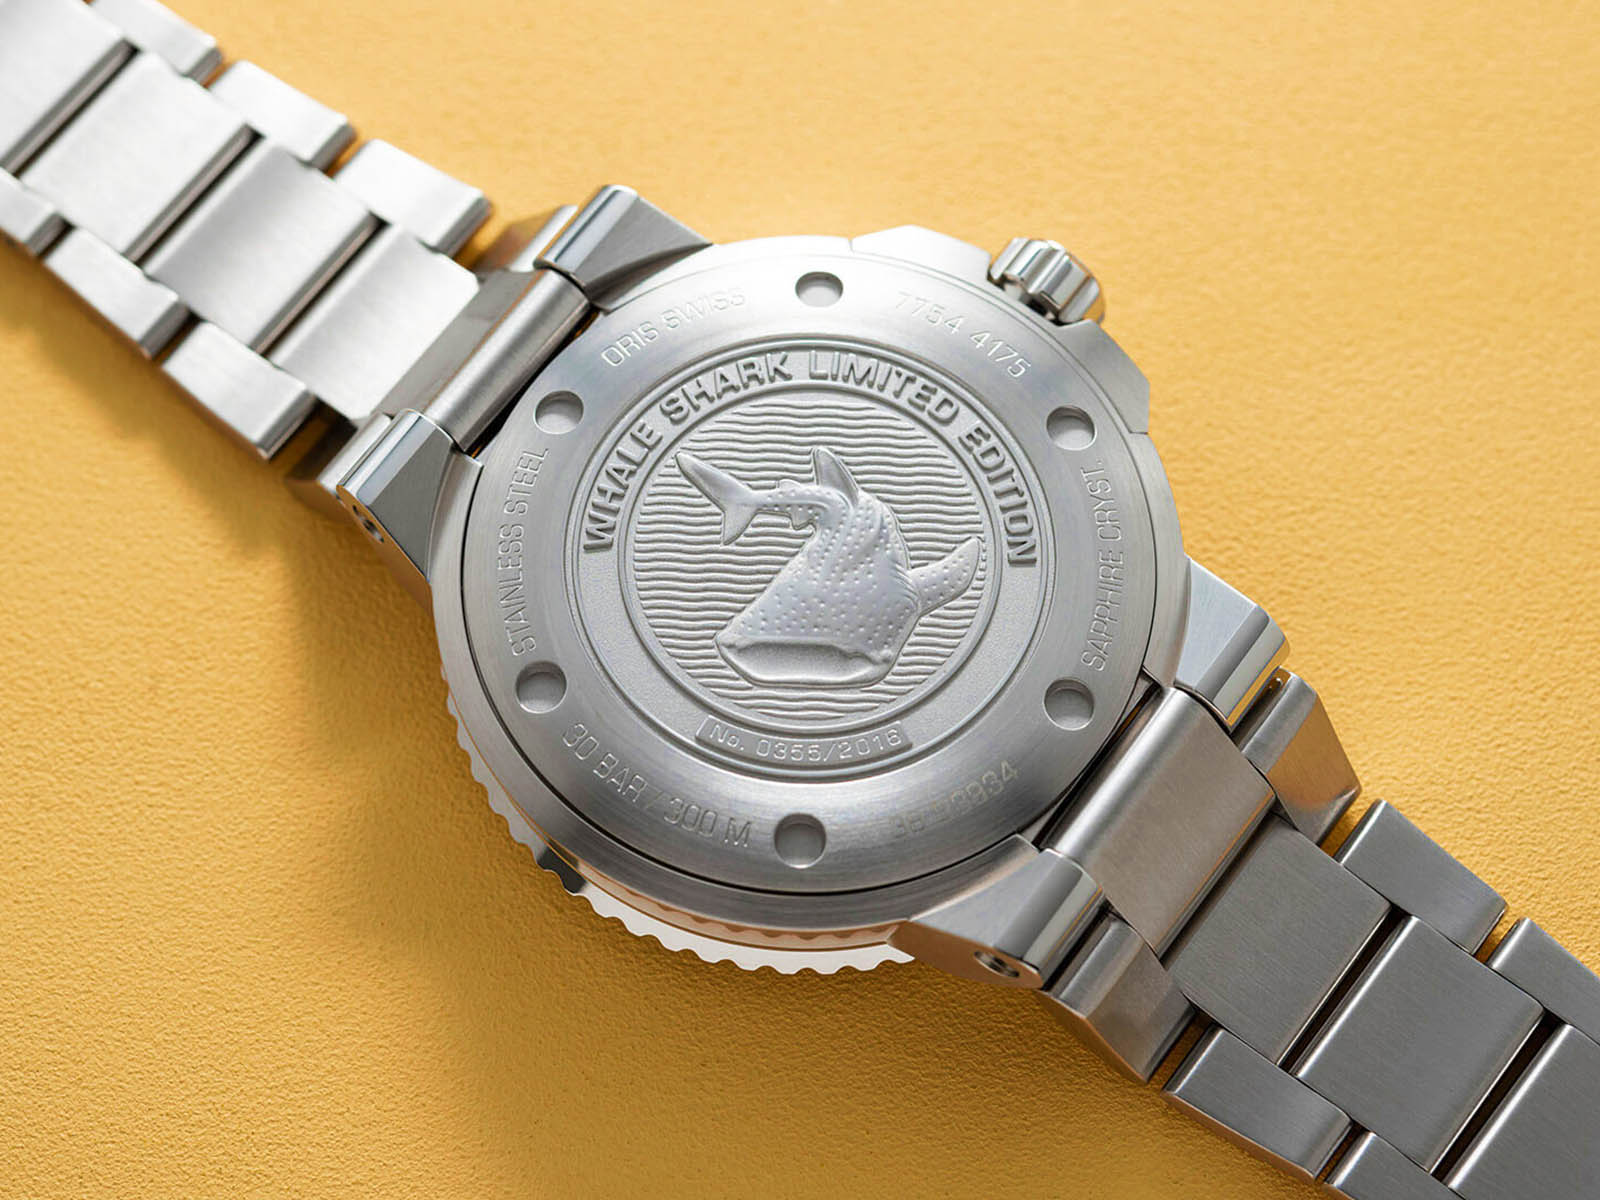 798-7754-4175-set-mb-oris-aquis-gmt-date-whale-shark-limited-edition-5.jpg